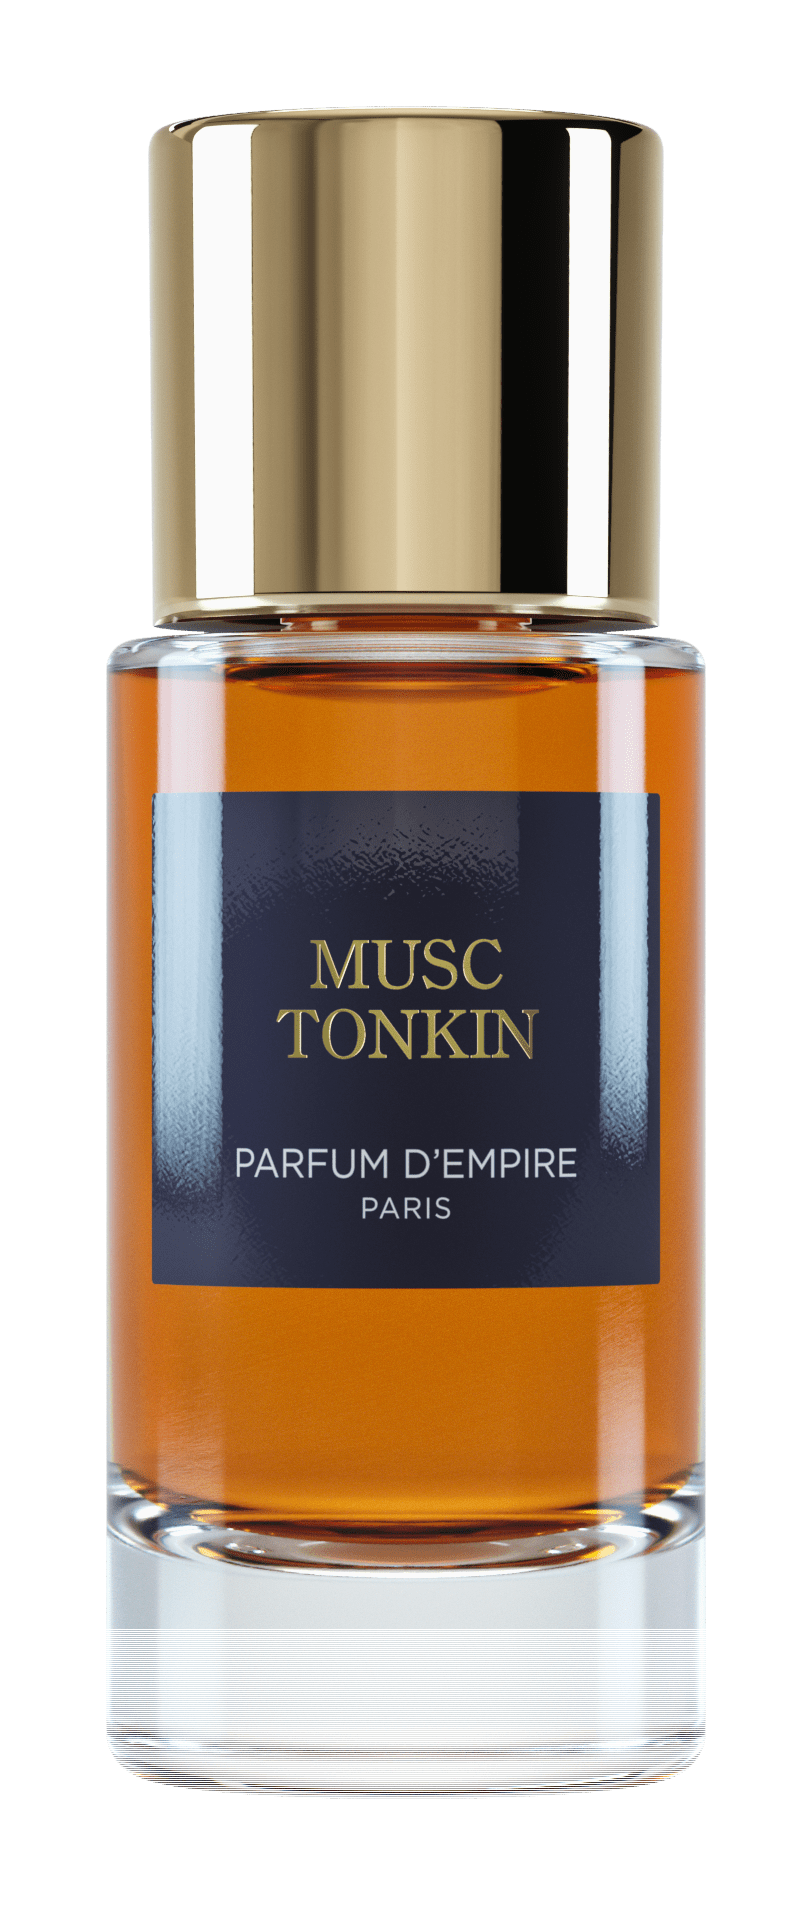 MUSC TONKIN